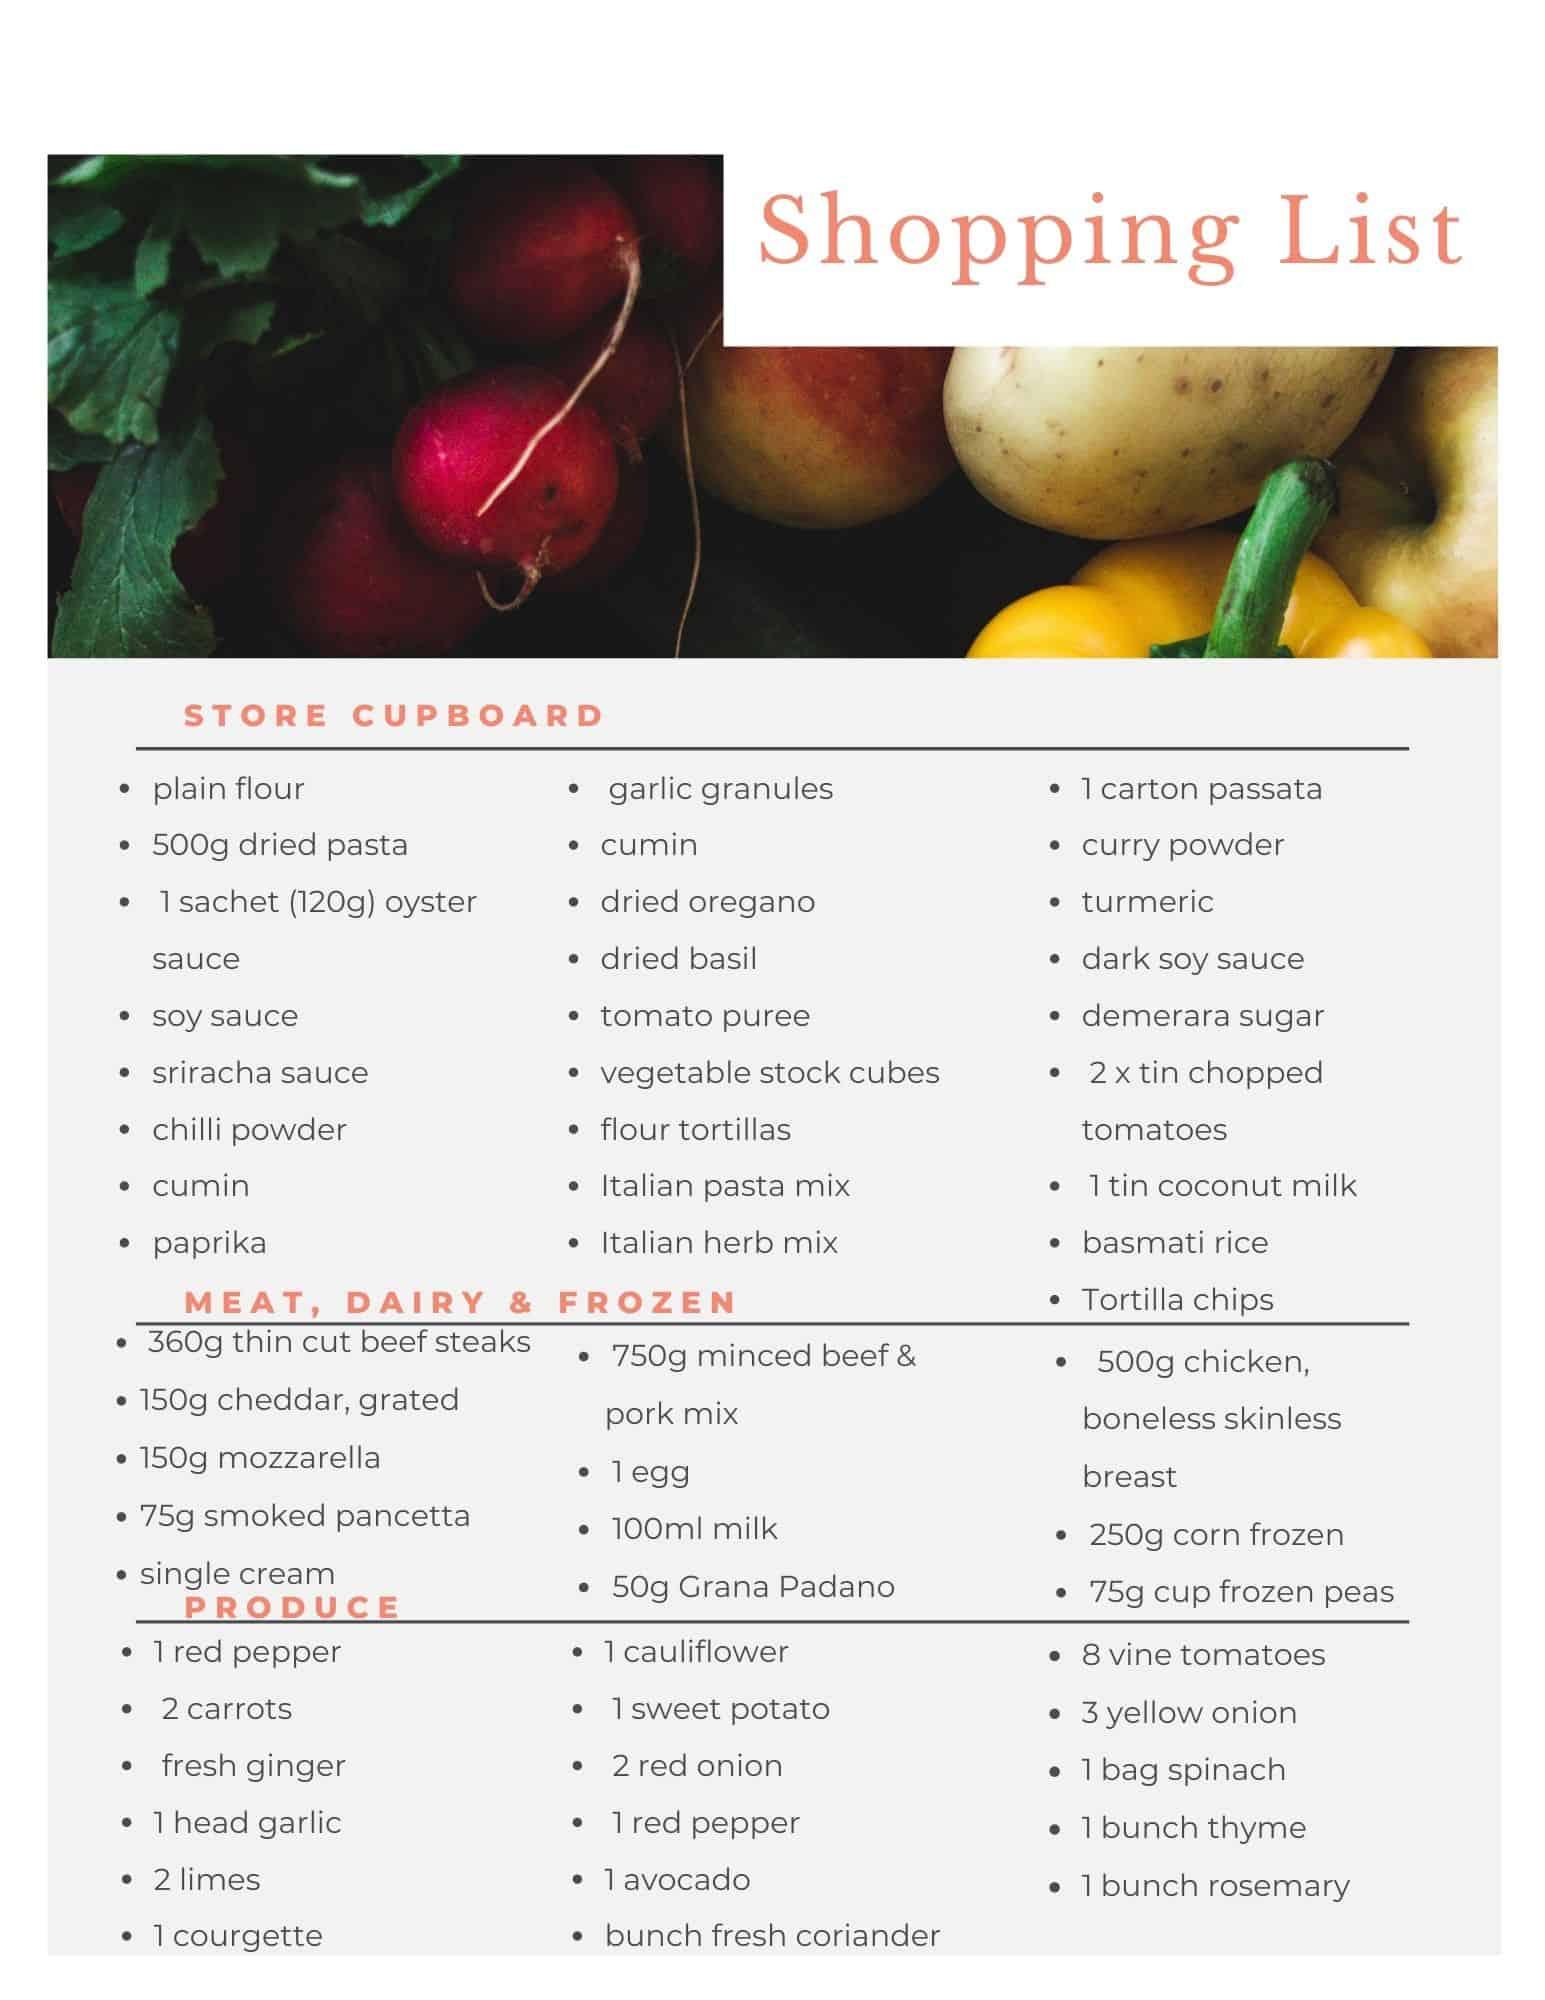 Aldi budget meal plan shopping list. Budget recipes.